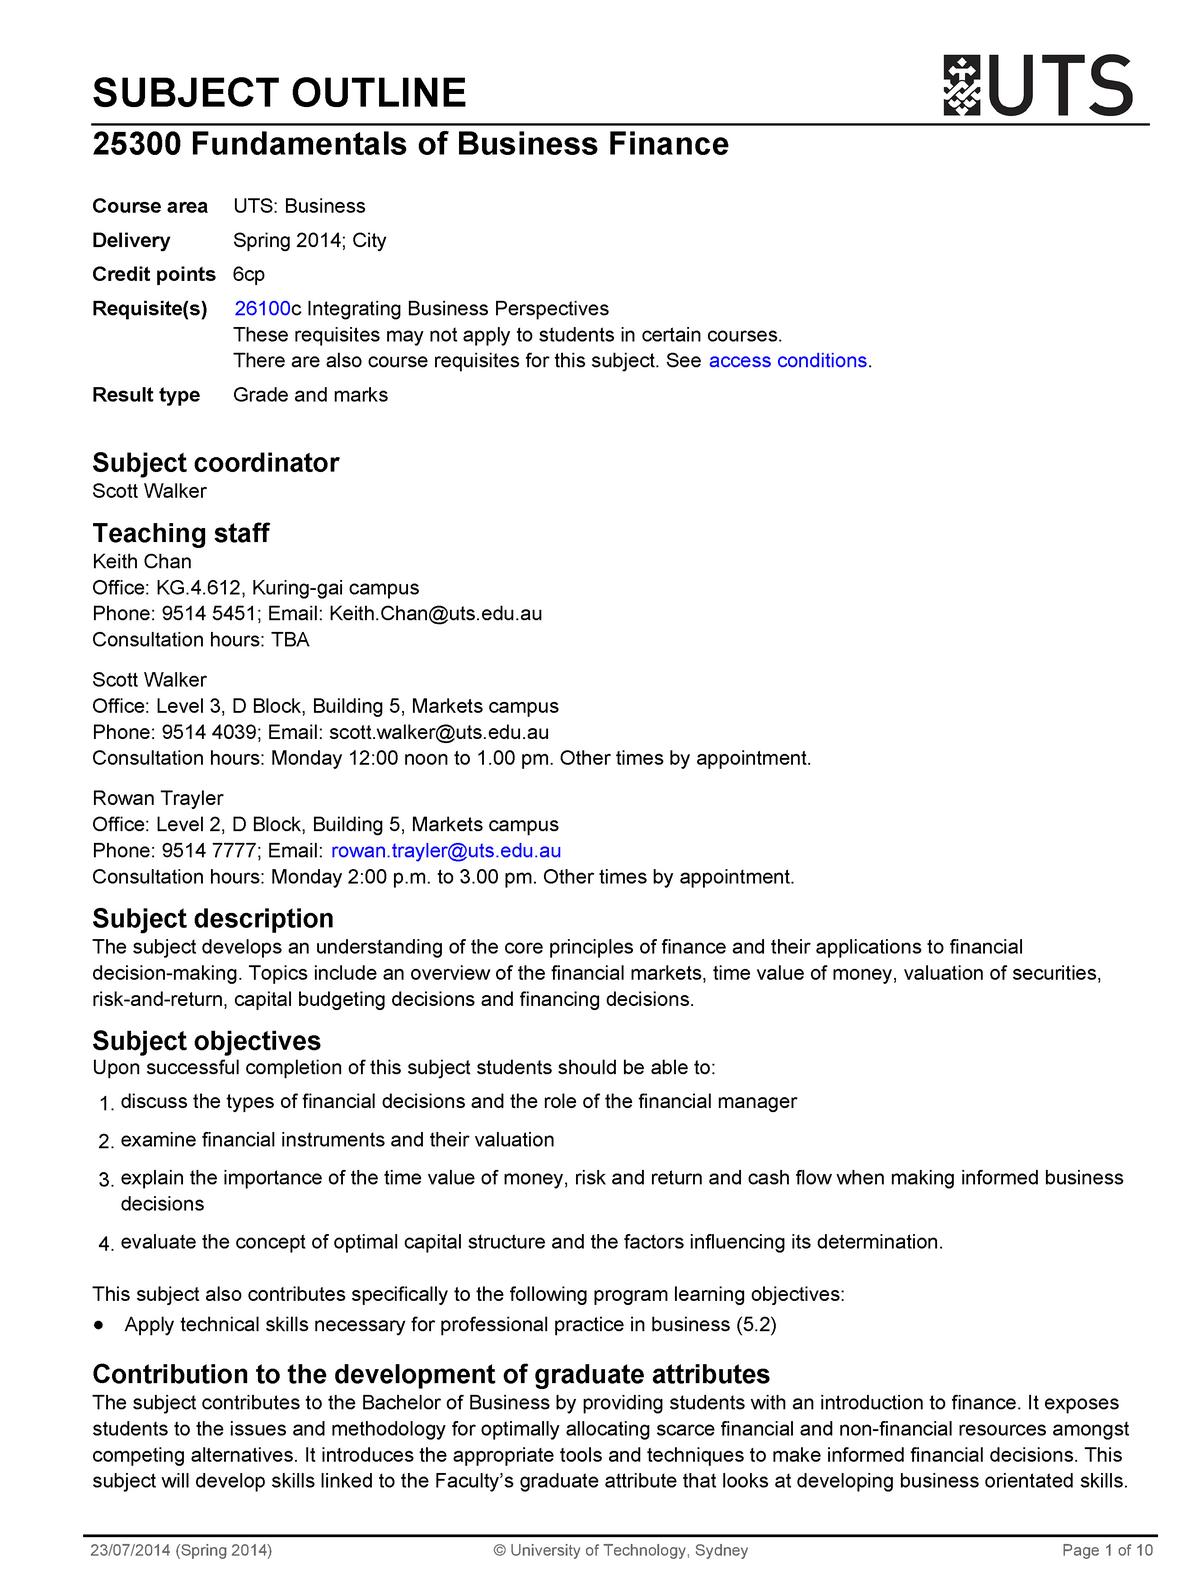 2014 SPR 25300 city - 025300 : Fundamentals of Business Finance